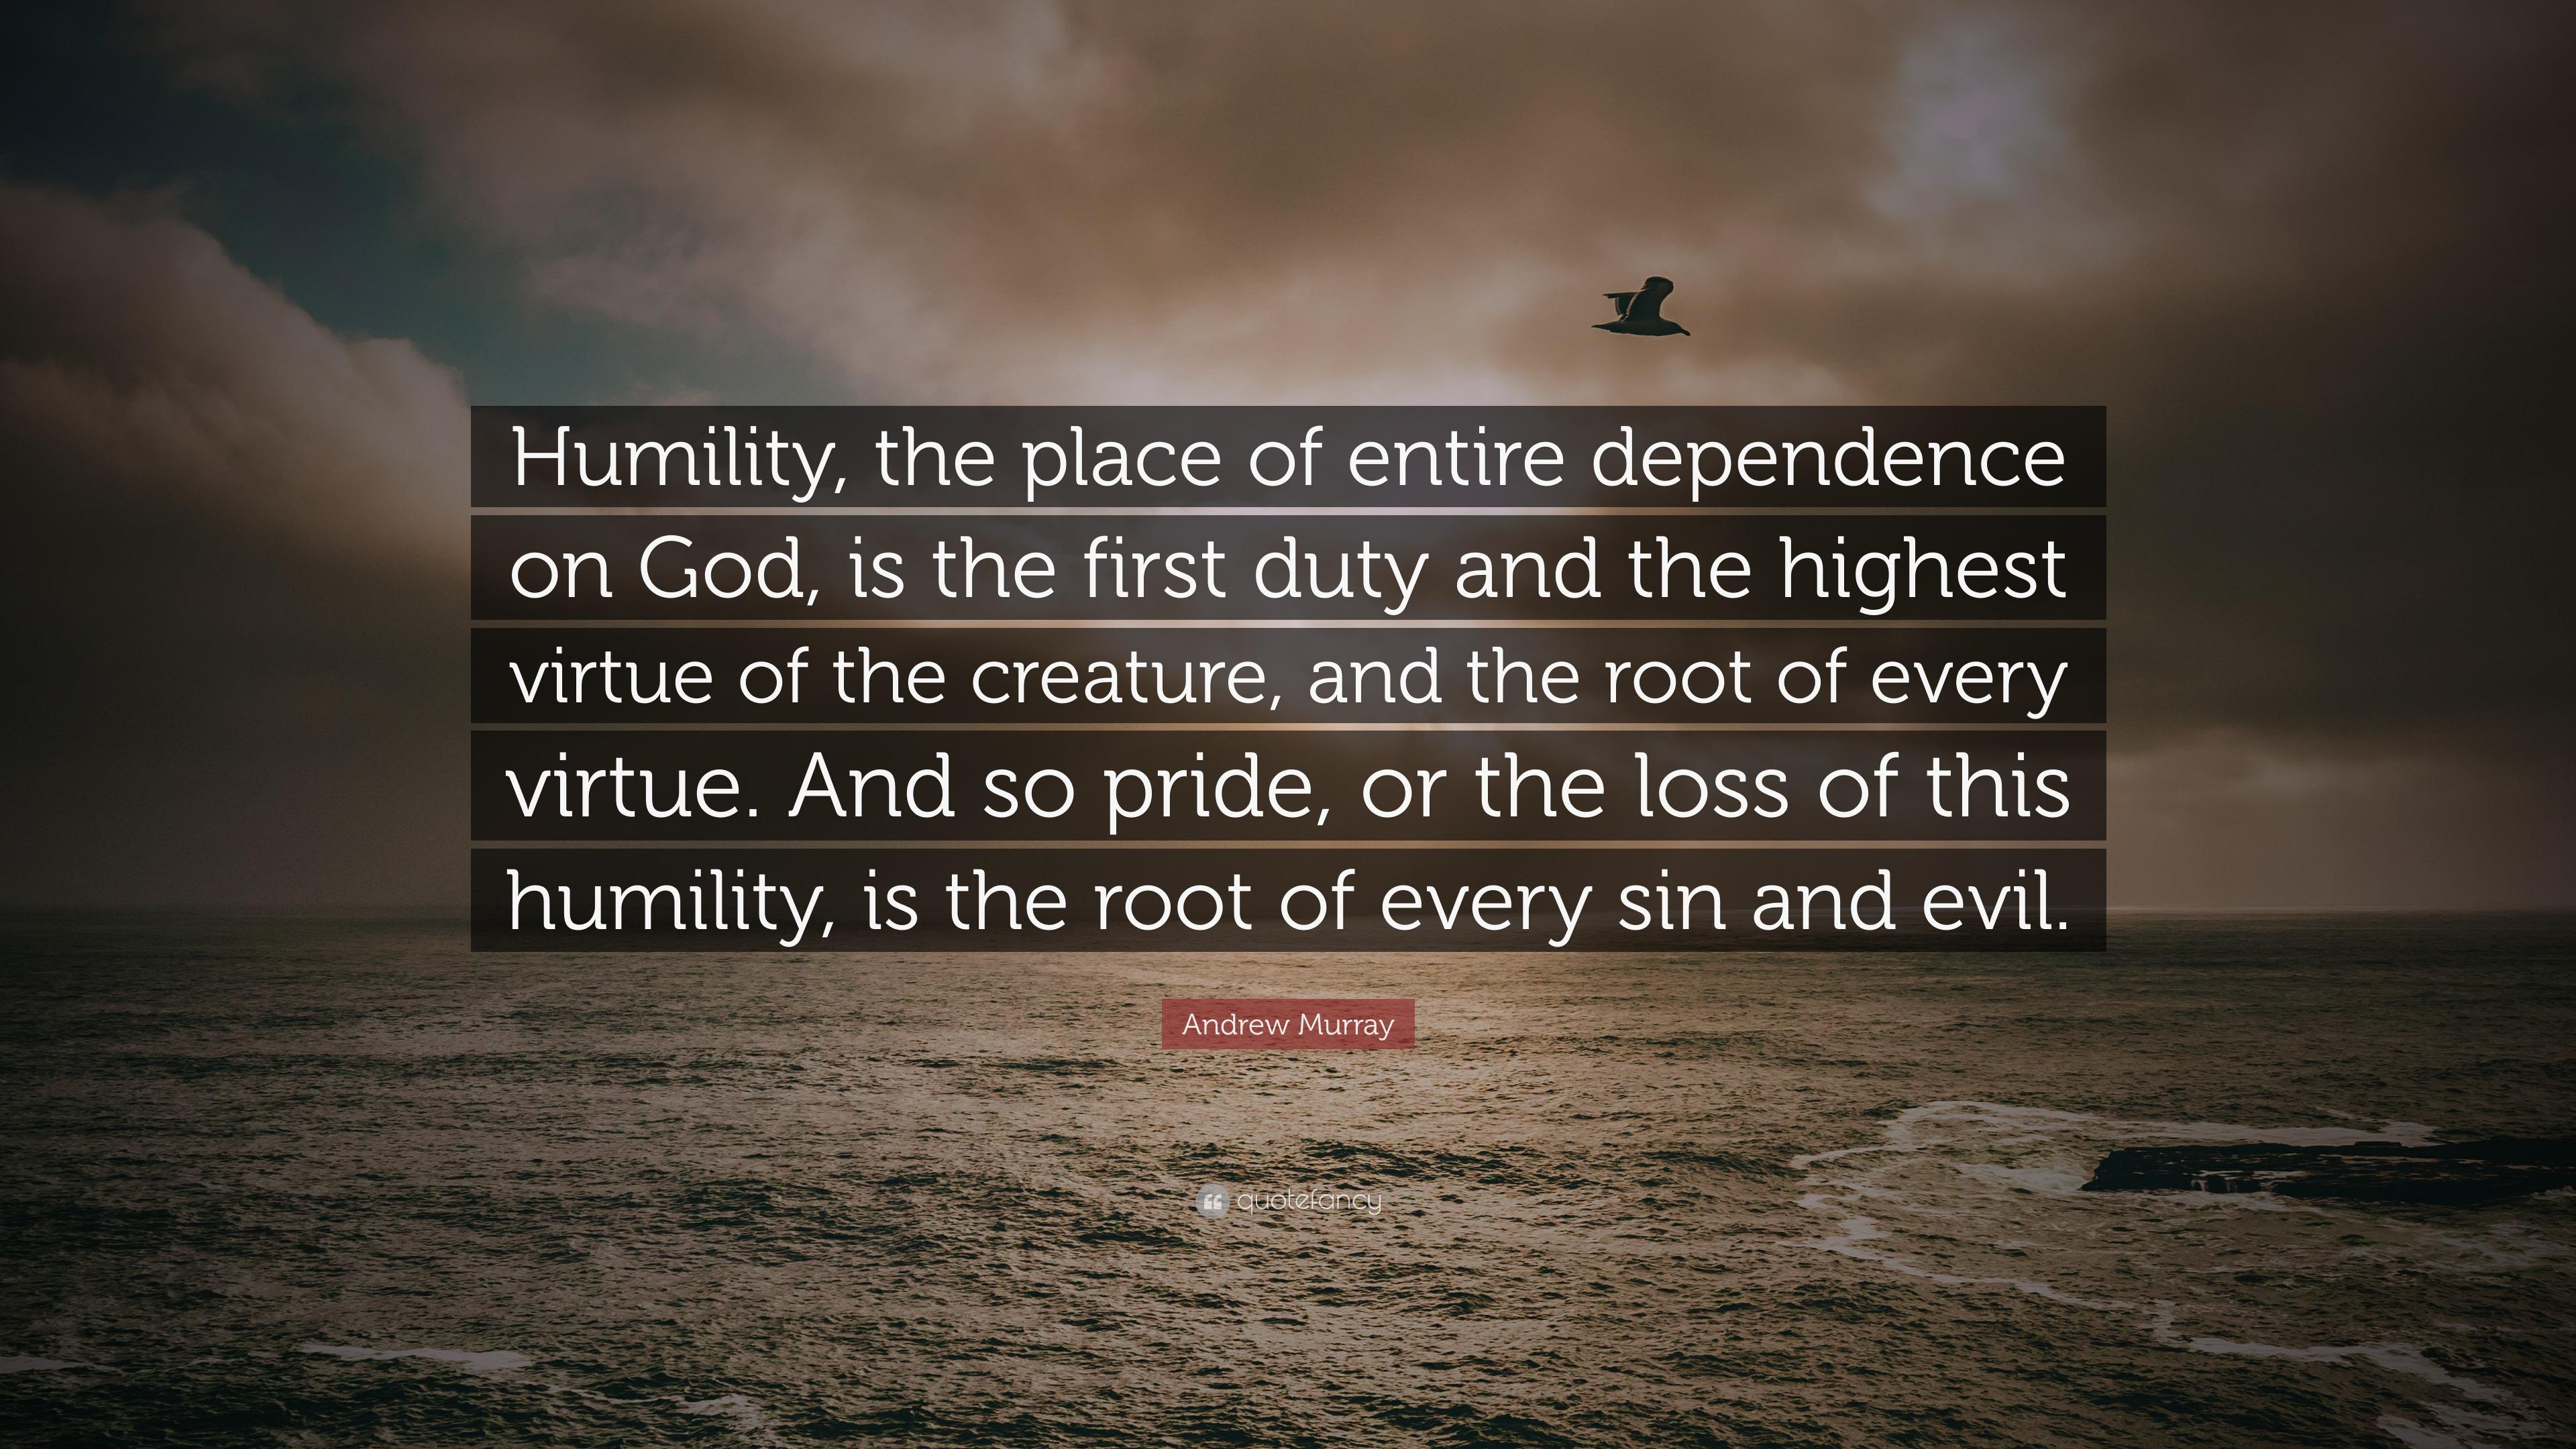 what is ultram dependence on god devotional